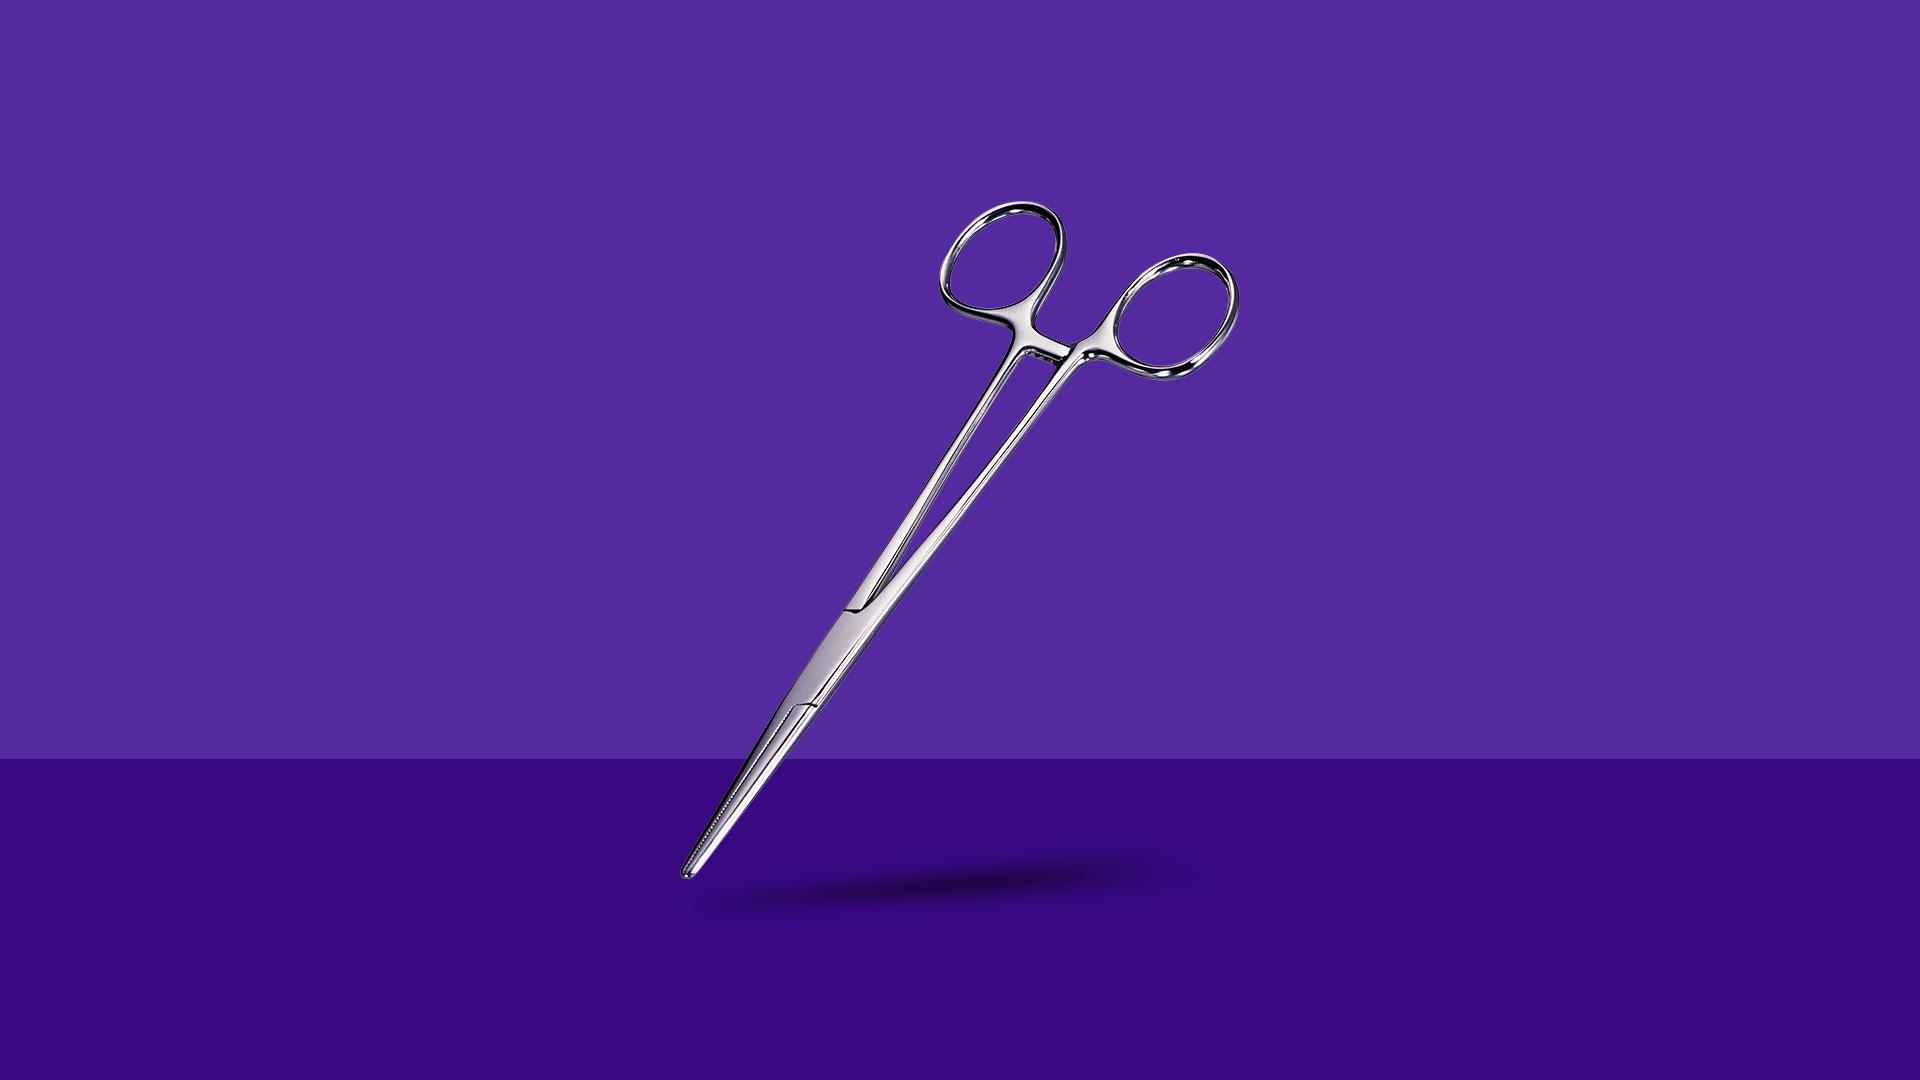 Endometriosis treatments and medications